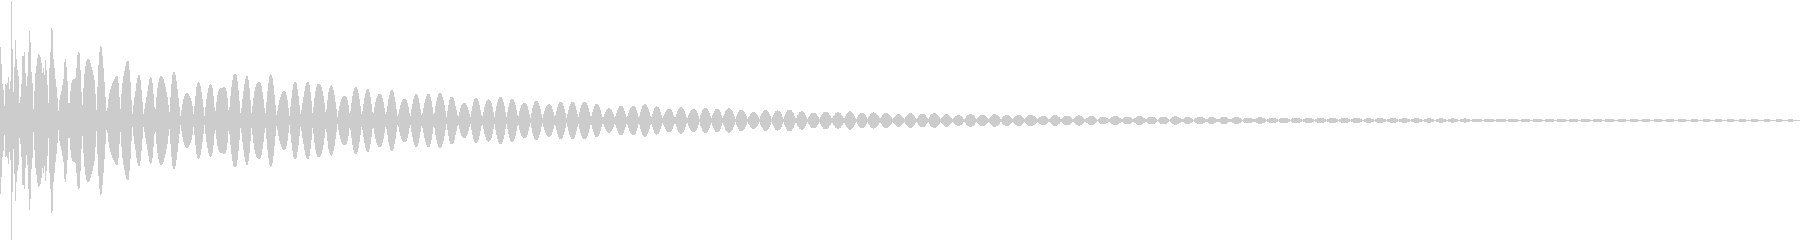 DTM Tom 37 オリジナル音源の未再生の波形